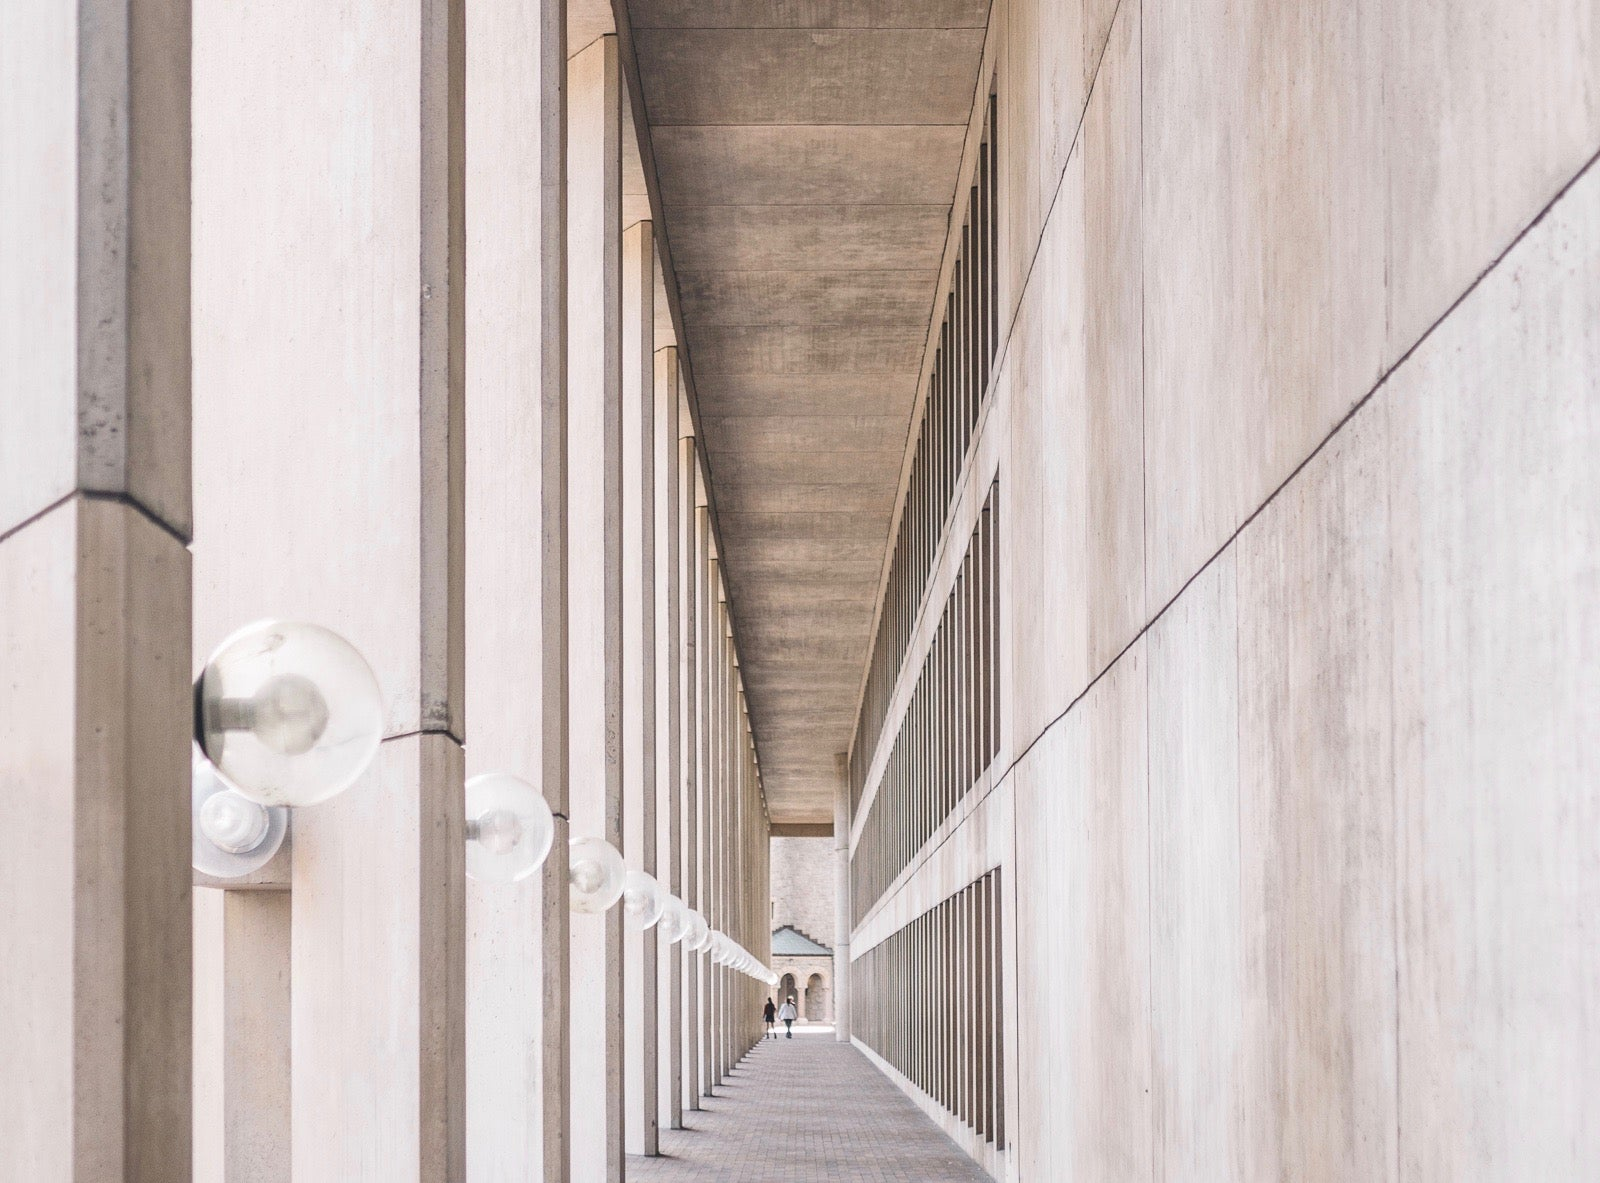 Photo down a row of columns creating an optical illusion